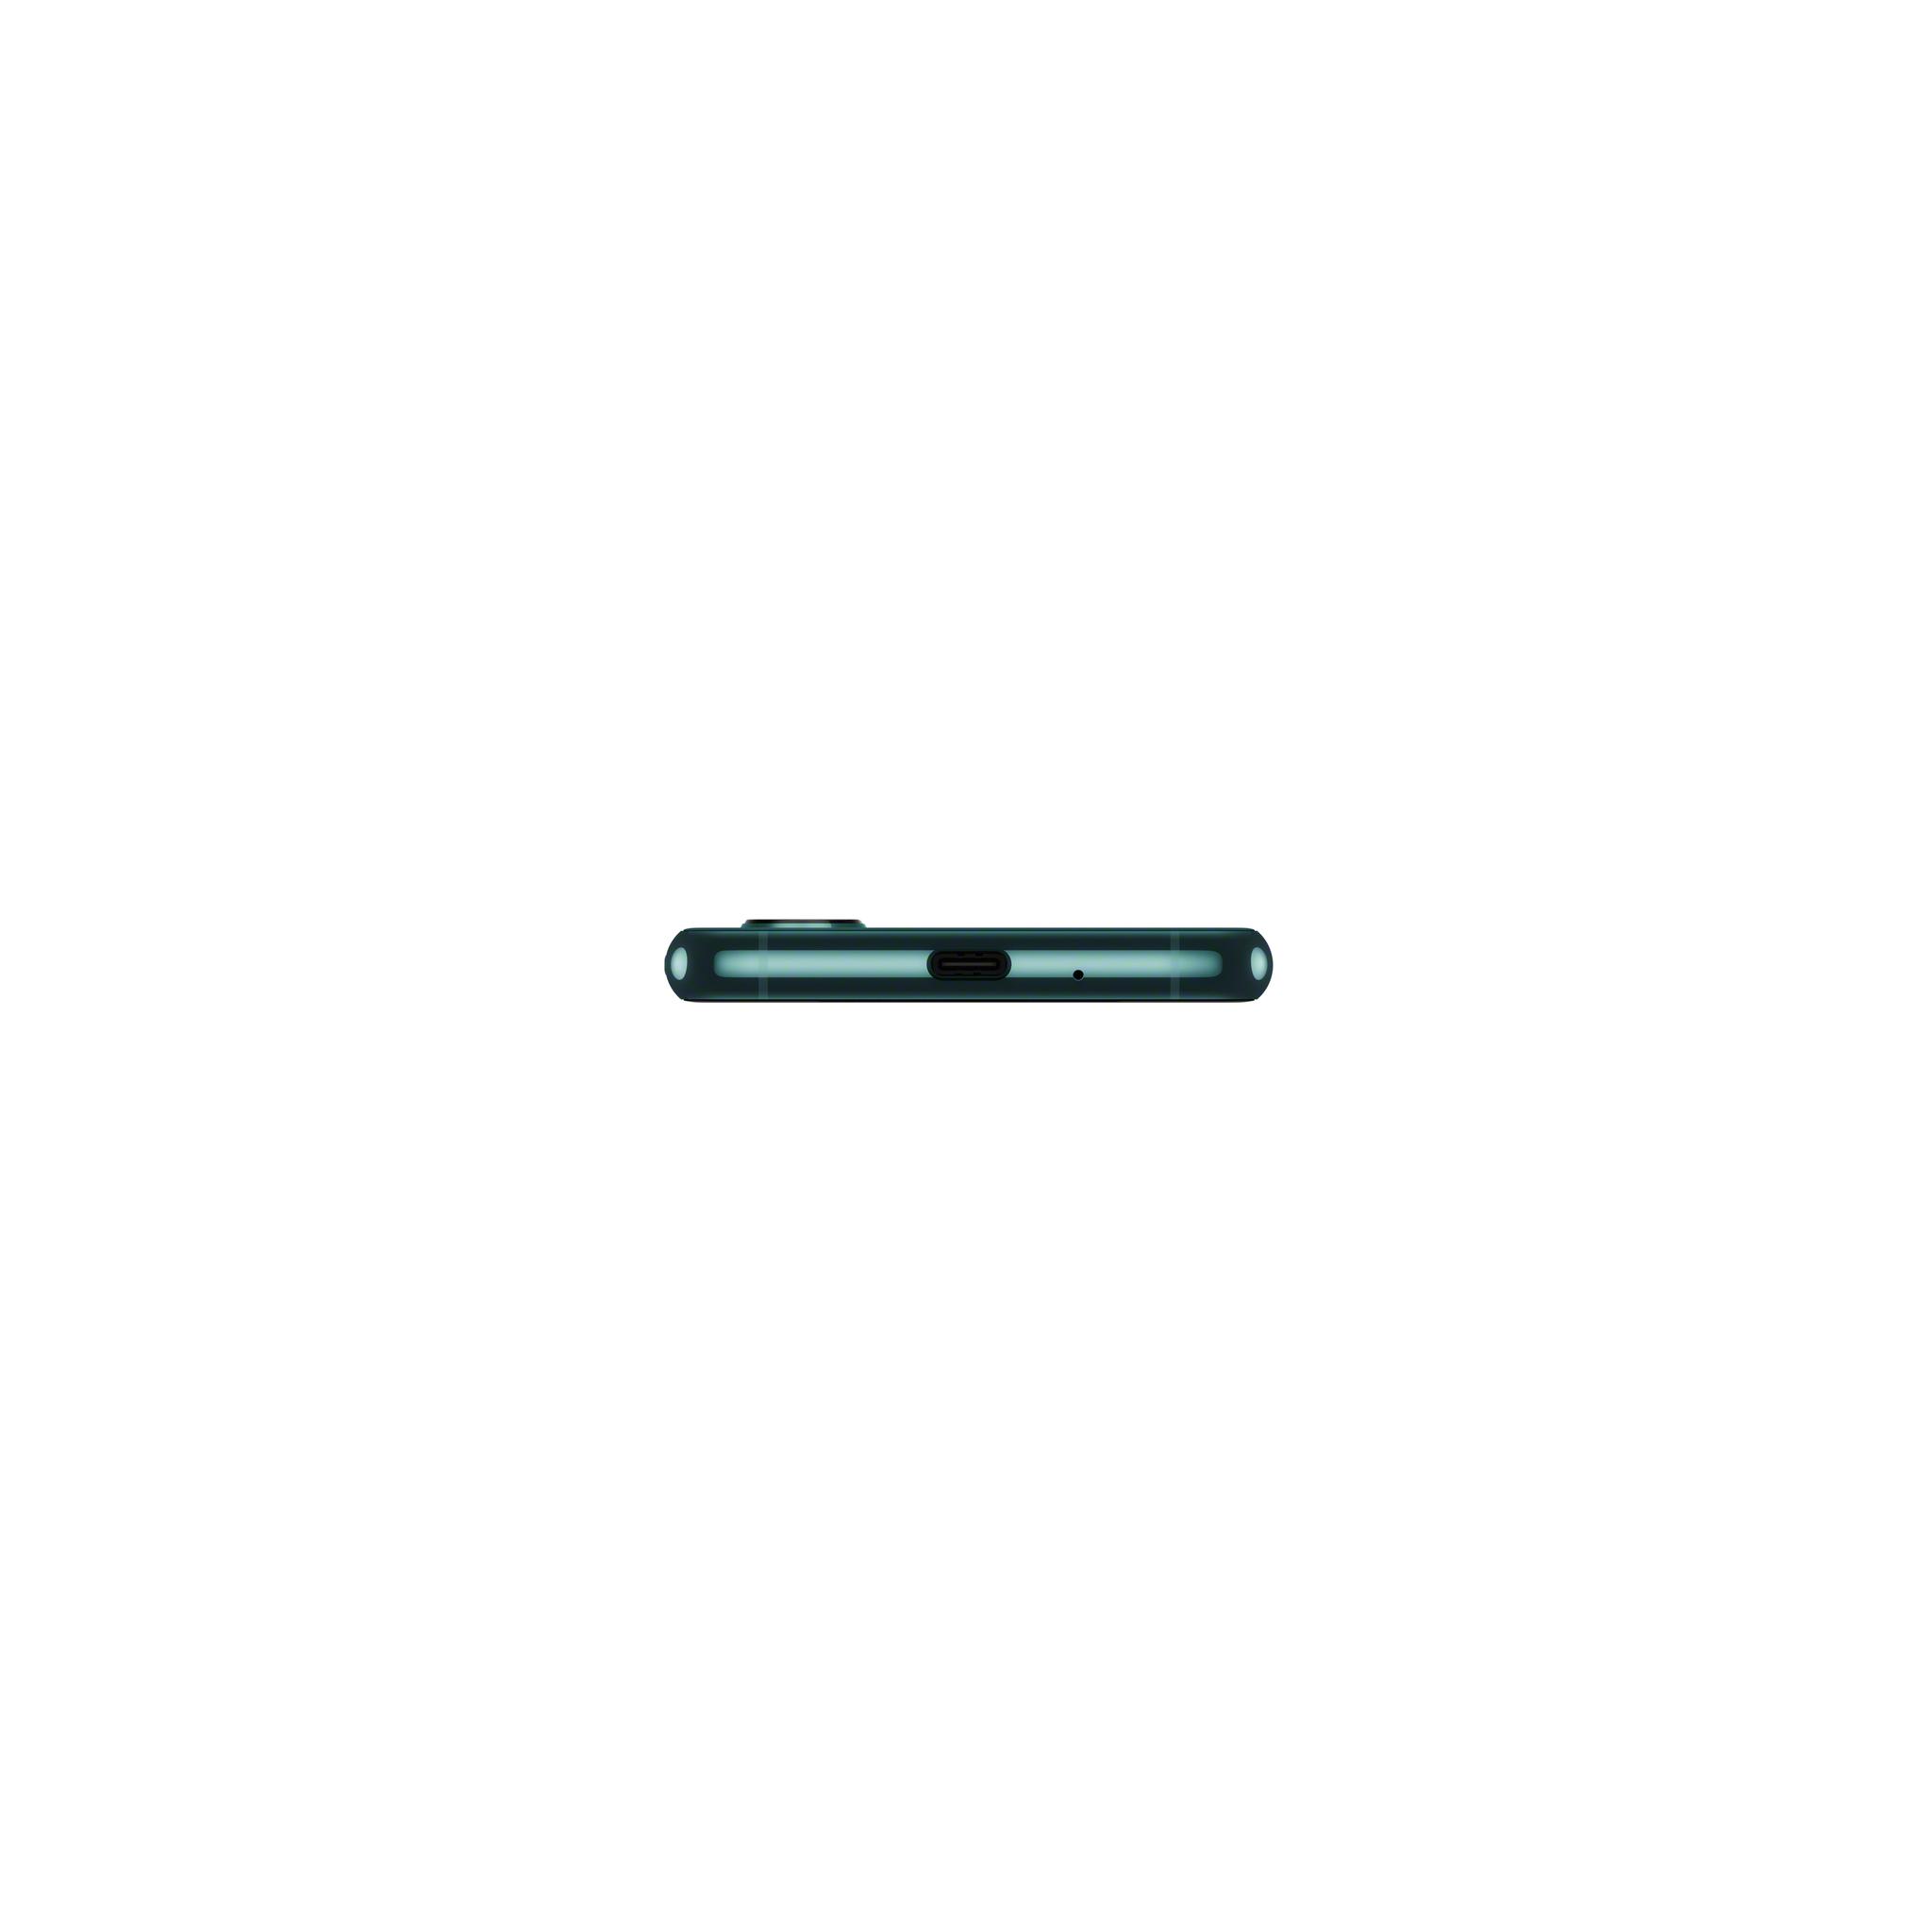 Xperia 5 III зелёный с USB-C